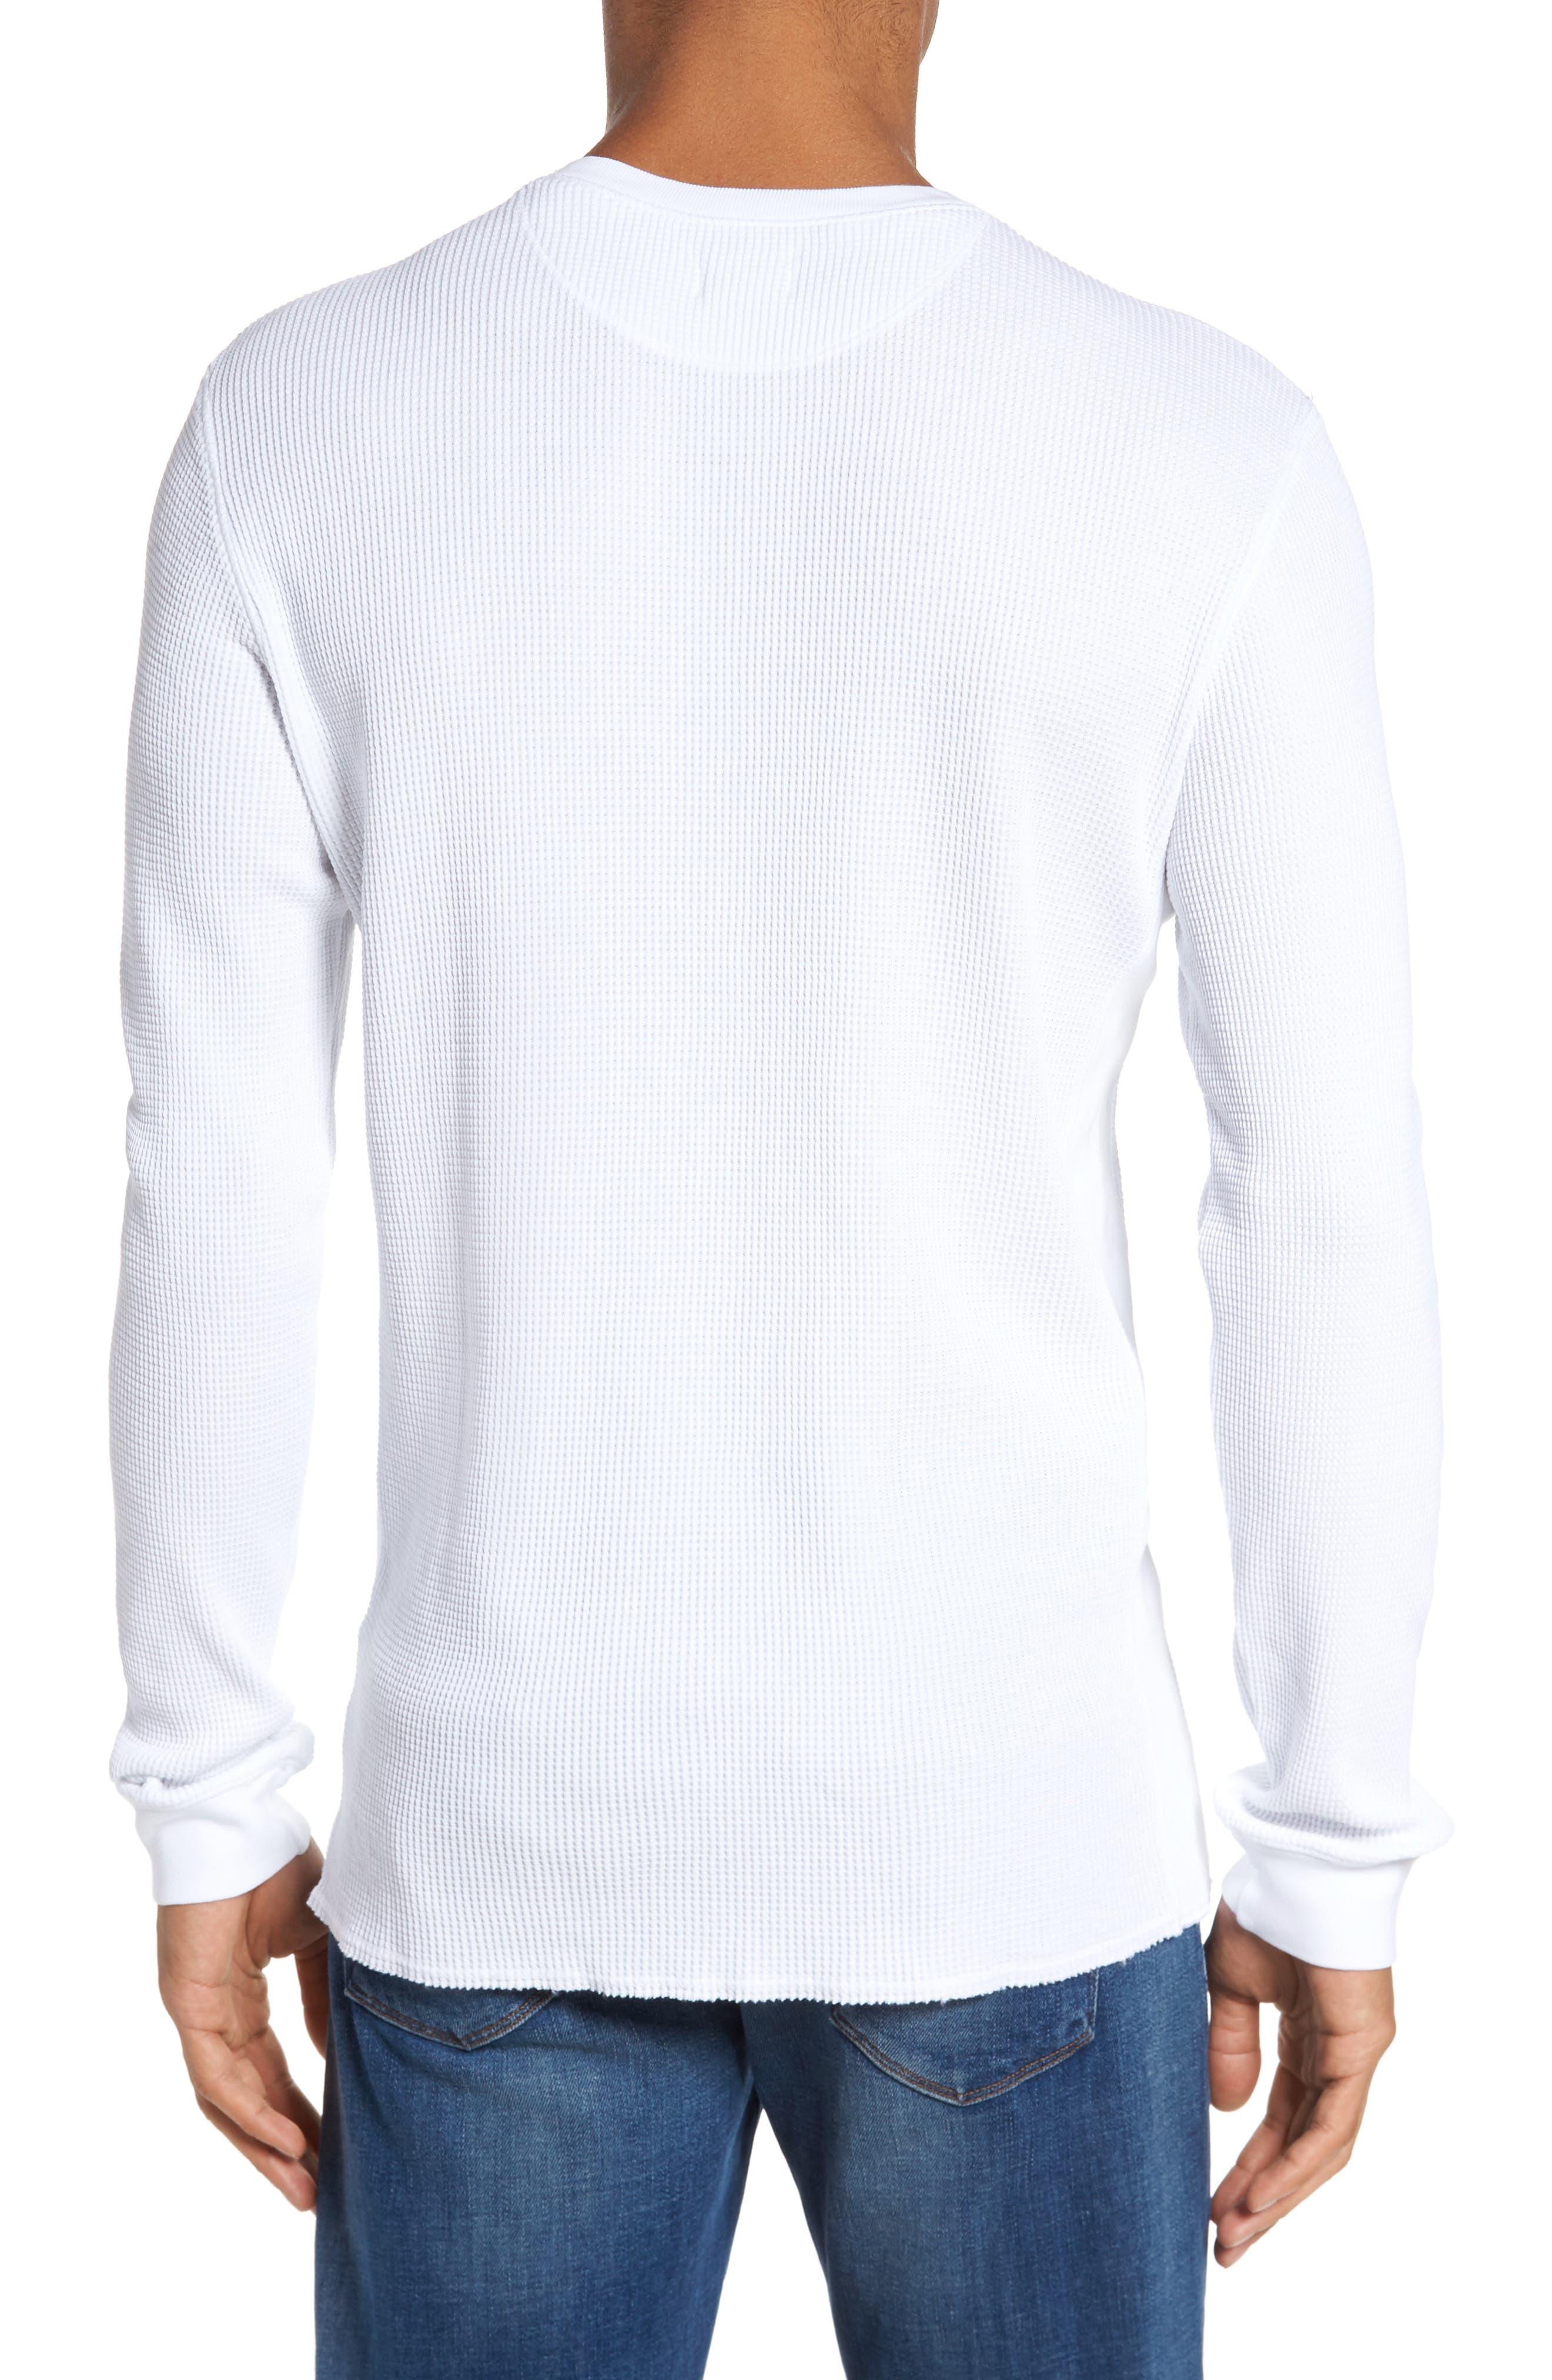 Travis Slim Fit Long Sleeve T-Shirt,                             Alternate thumbnail 2, color,                             True White